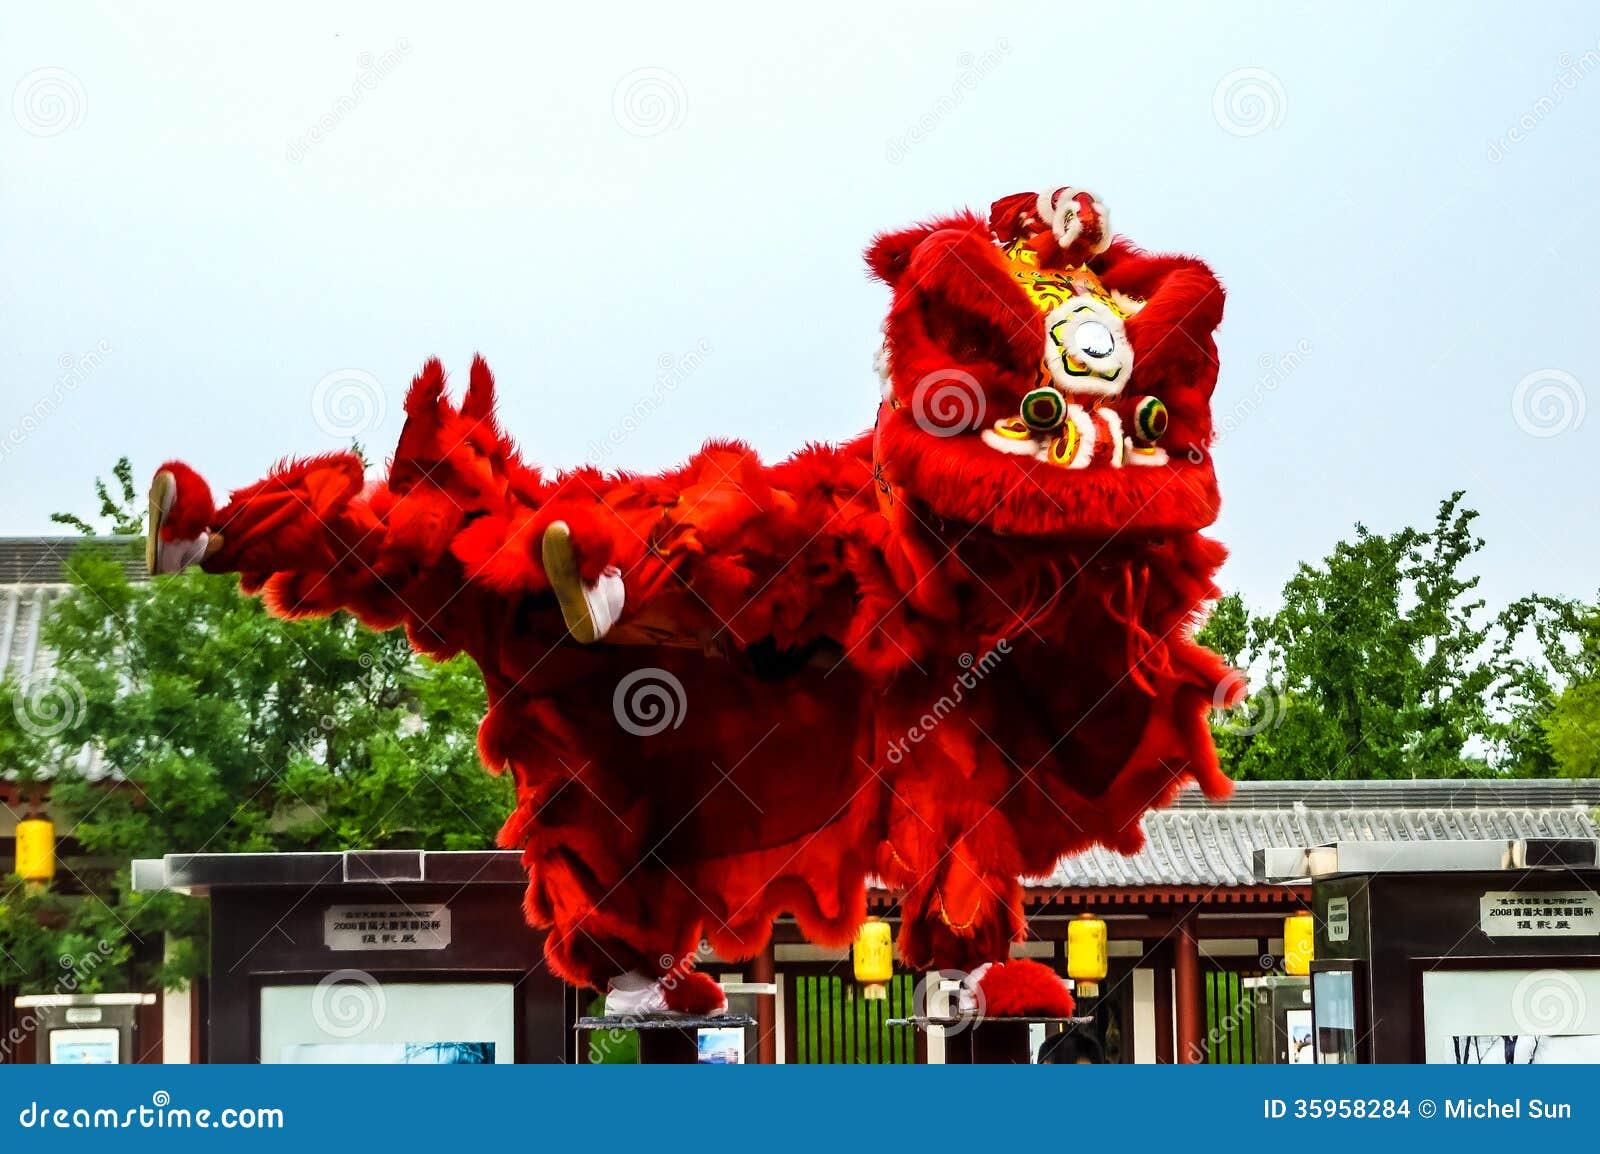 Chinese New Year Liontraditional Lion Dance 187 Li Iu Home Design